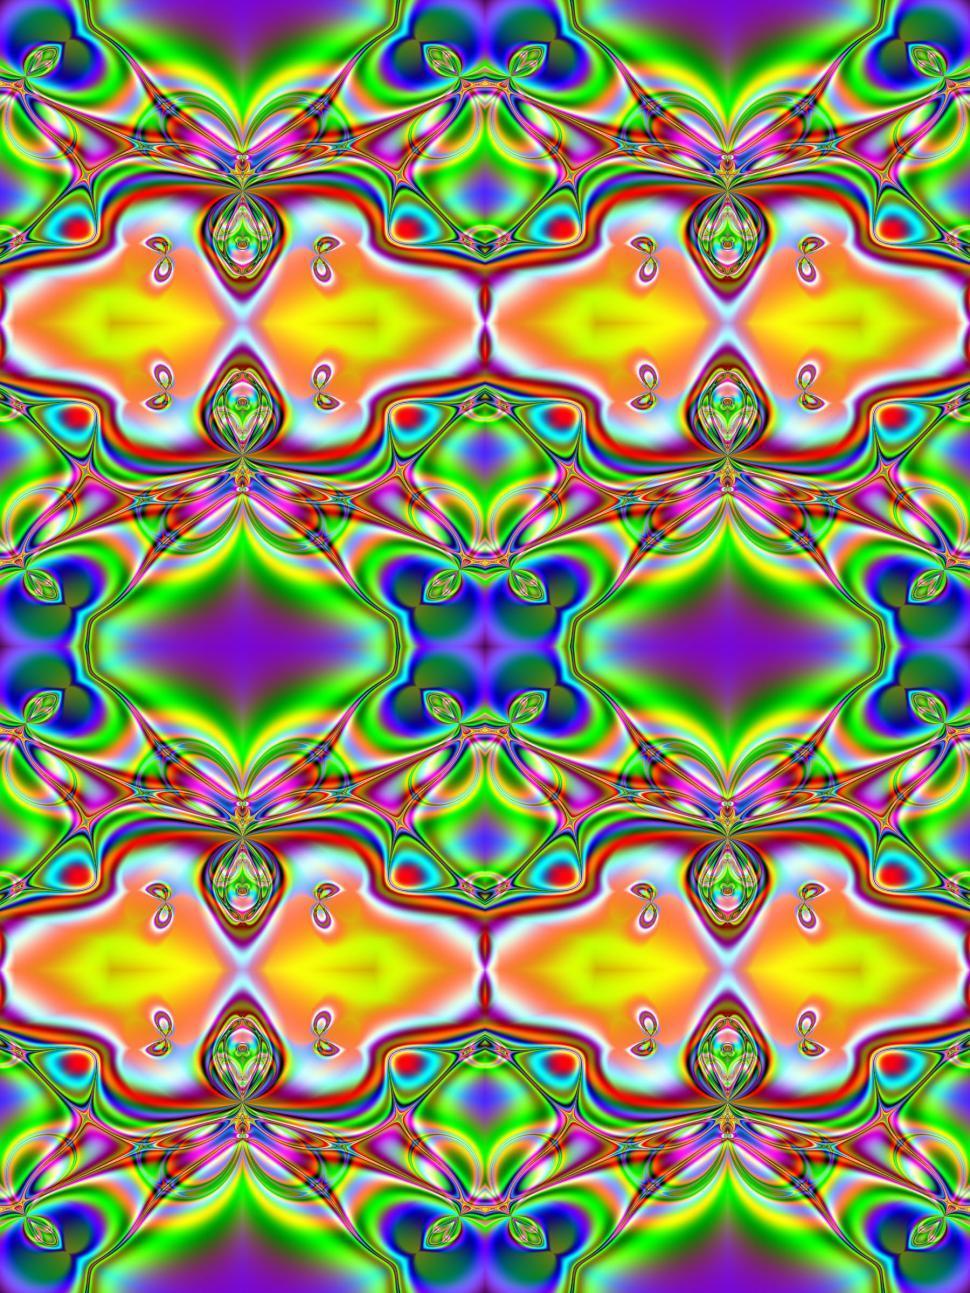 Download Free Stock Photo of Fractal-based Tile